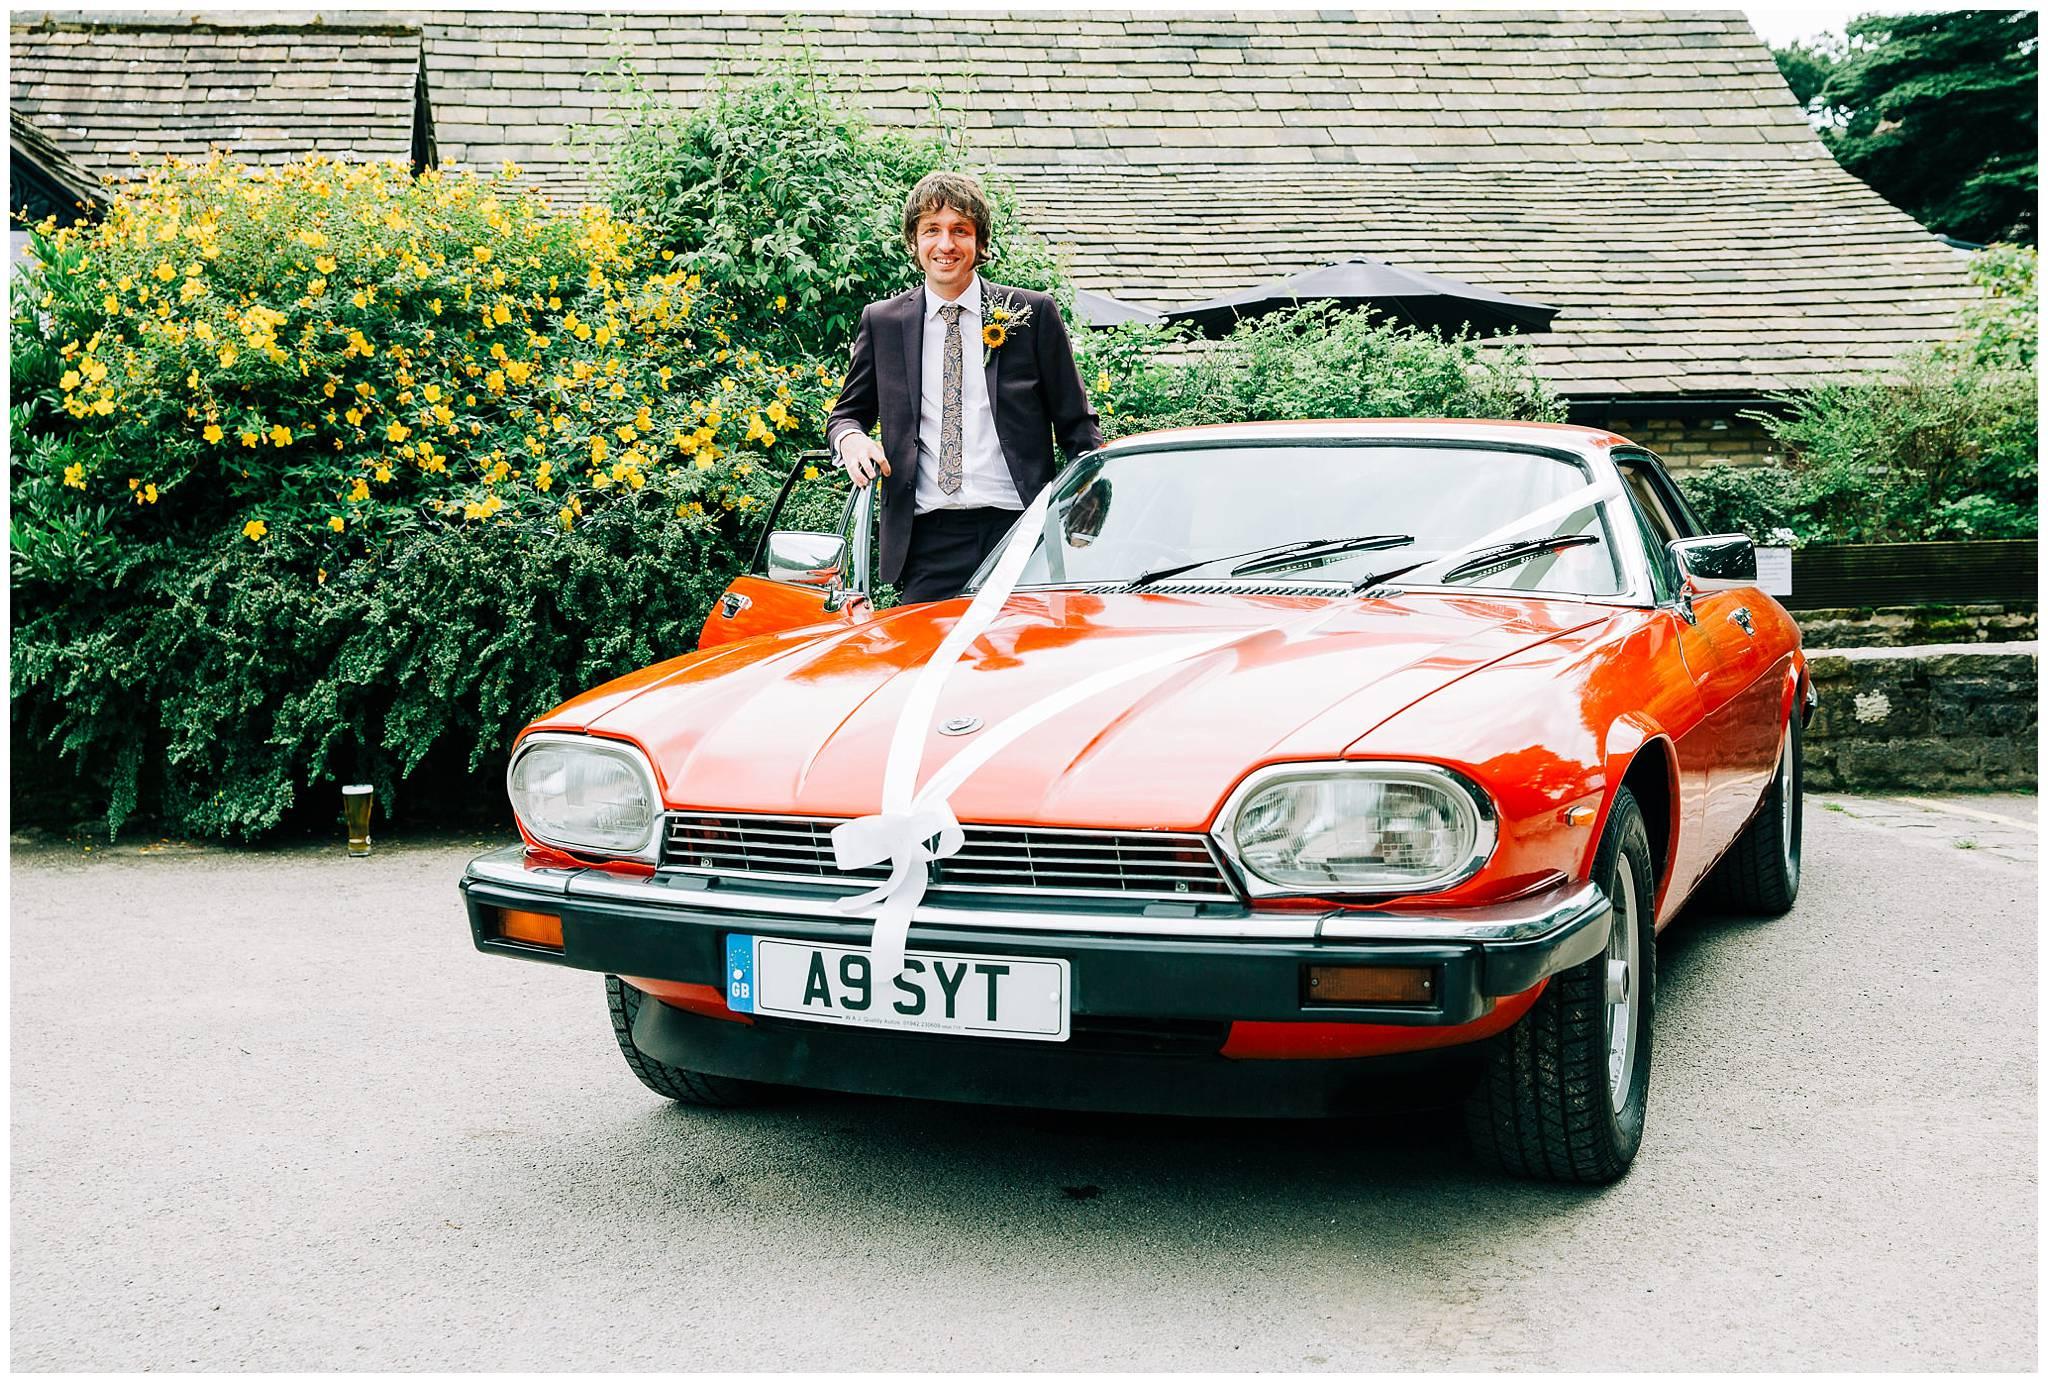 groom stood in open car door of red vintage car